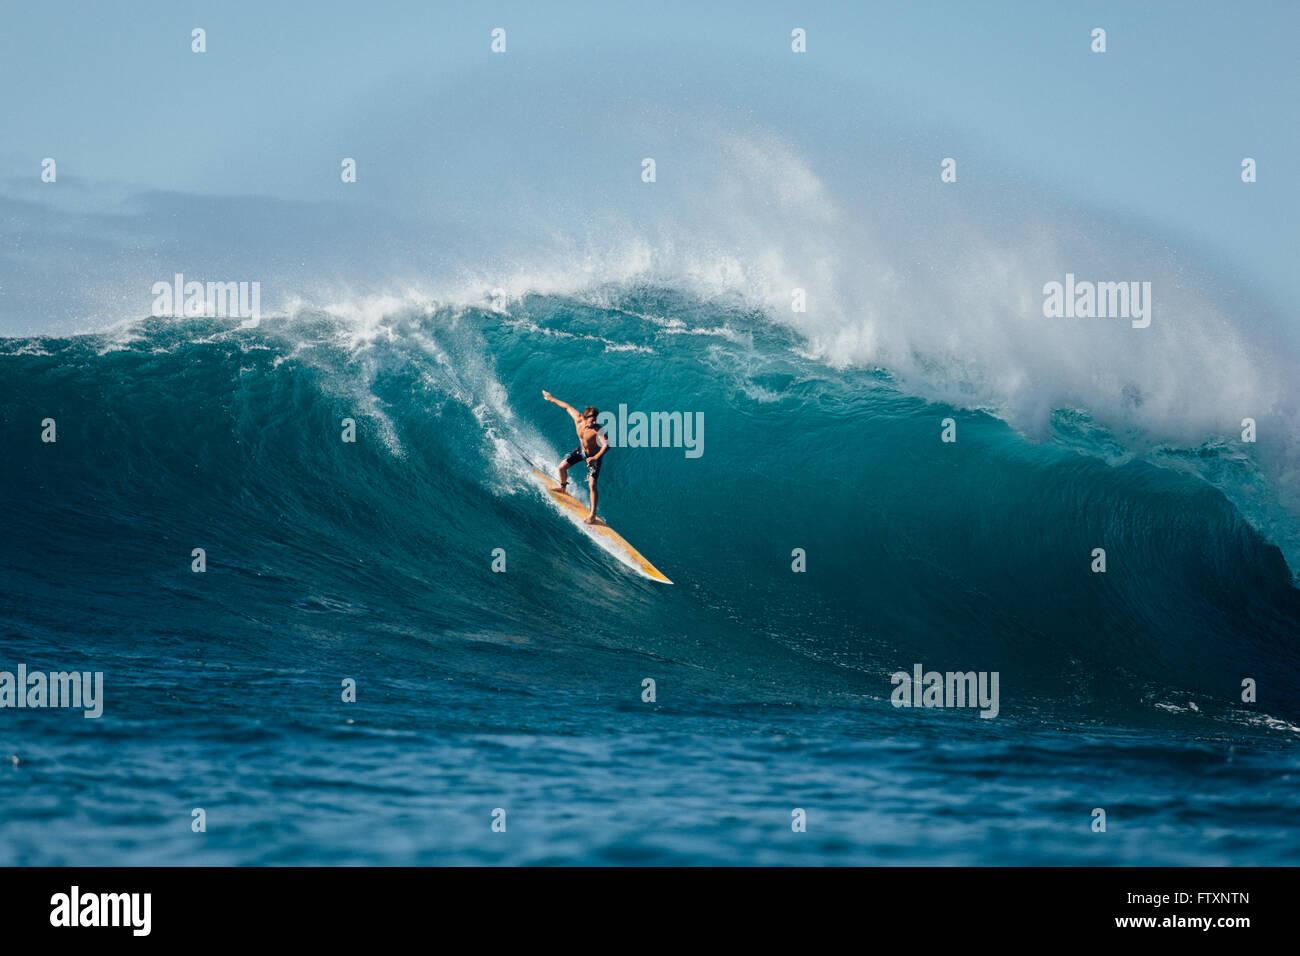 Homme surf vague, Waimea Bay, North Shore, Oahu, Hawaii, États-Unis Banque D'Images